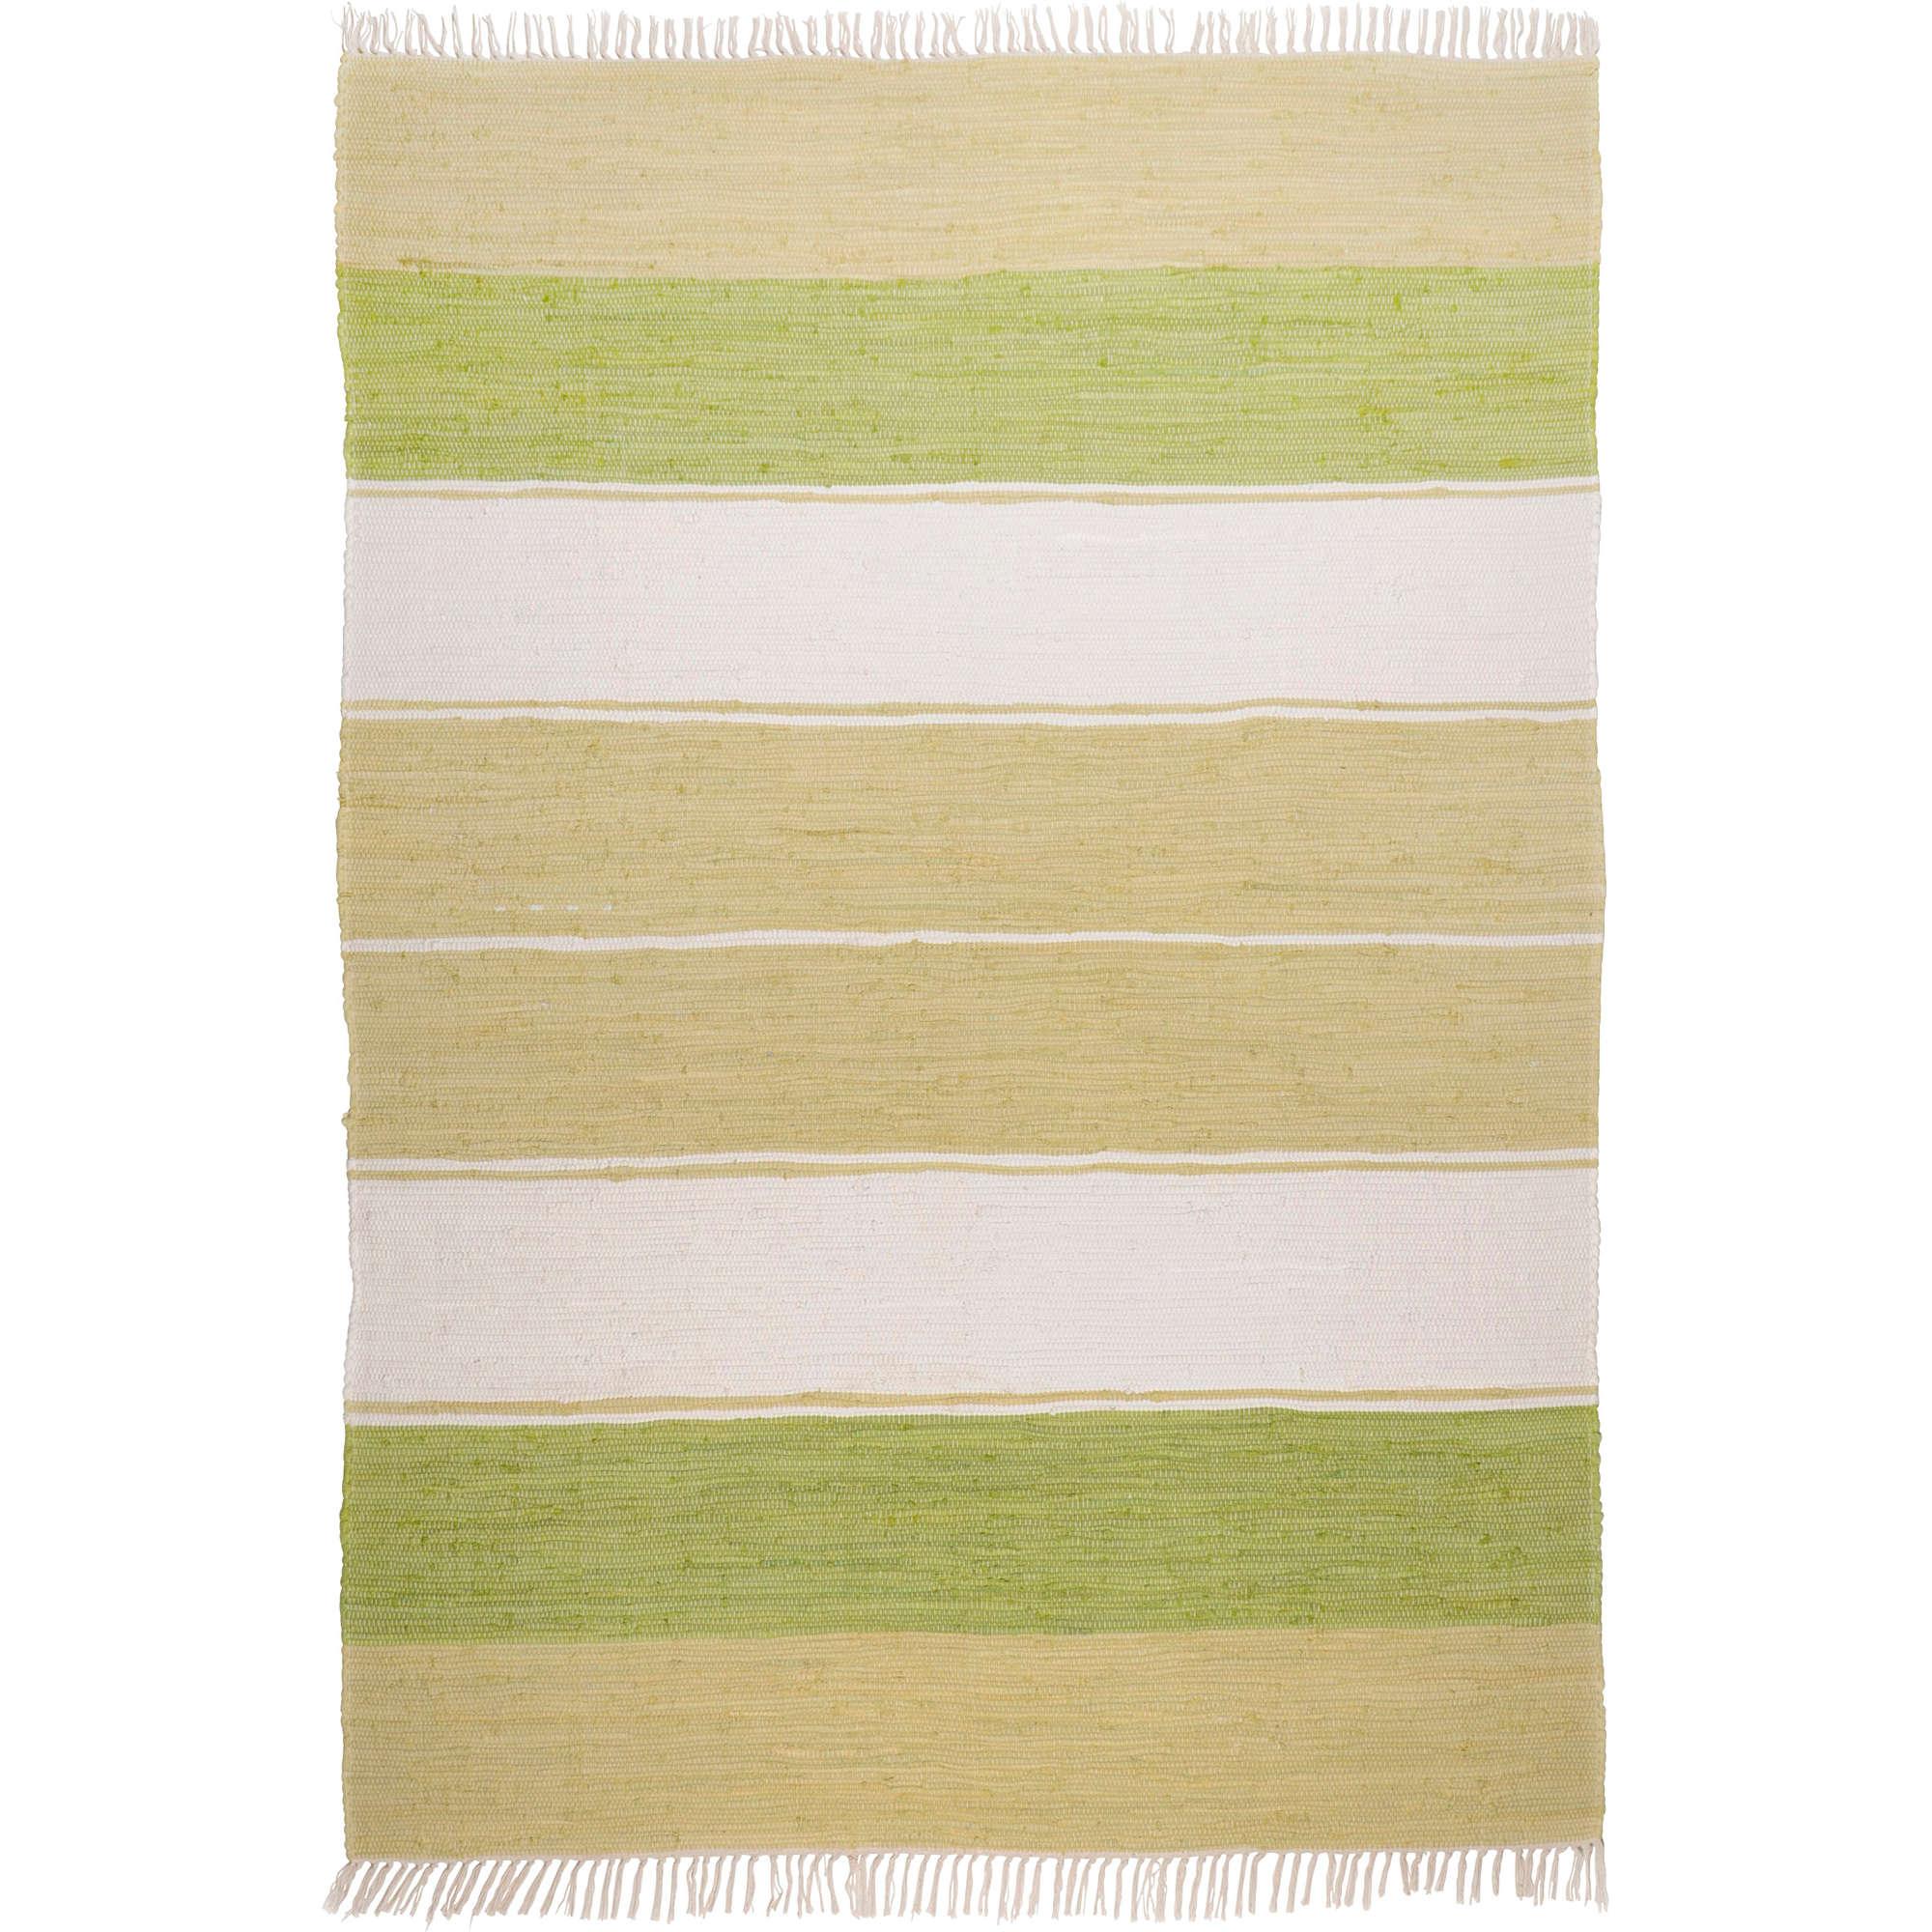 THEKO Teppich 60x120 Cm lindgrün | eBay